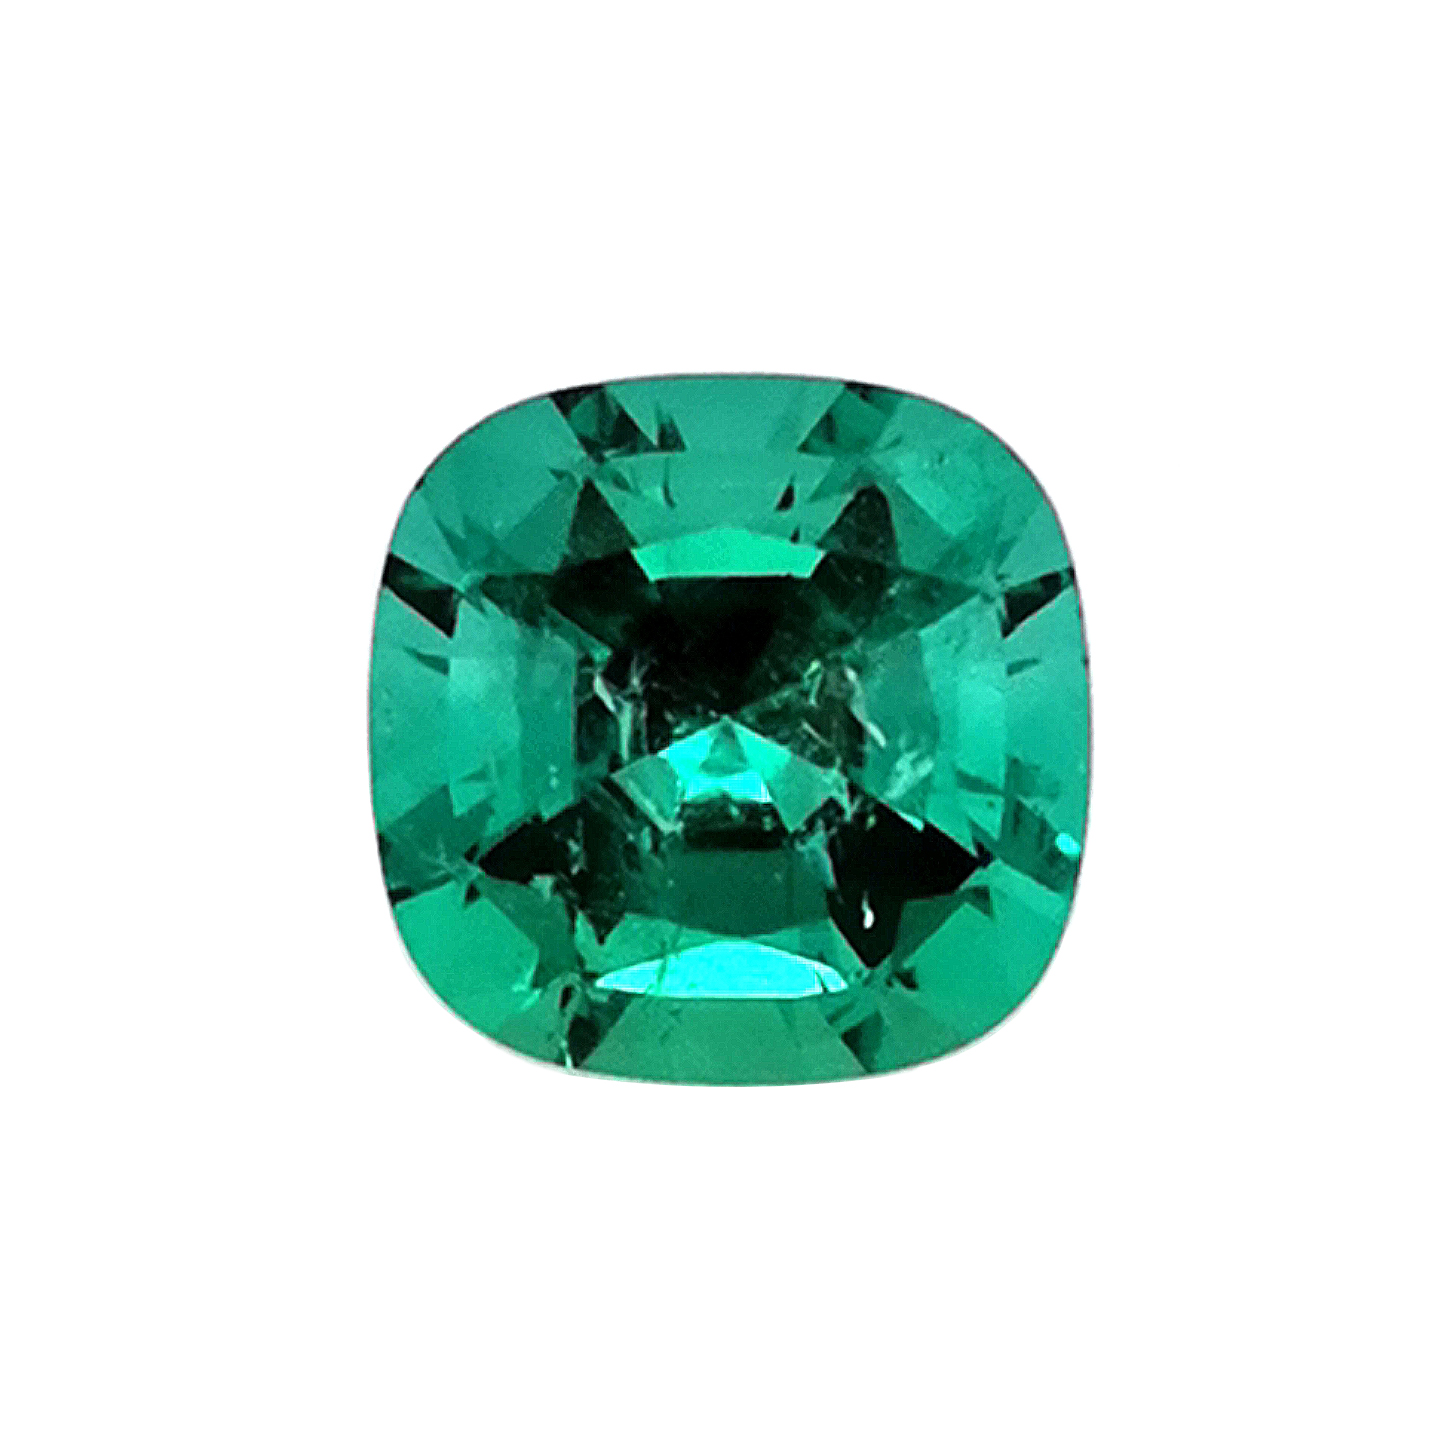 Smaragd AAAA 3,06 ct Kissenform mixed cut Sammler Edelstein mit Expertise